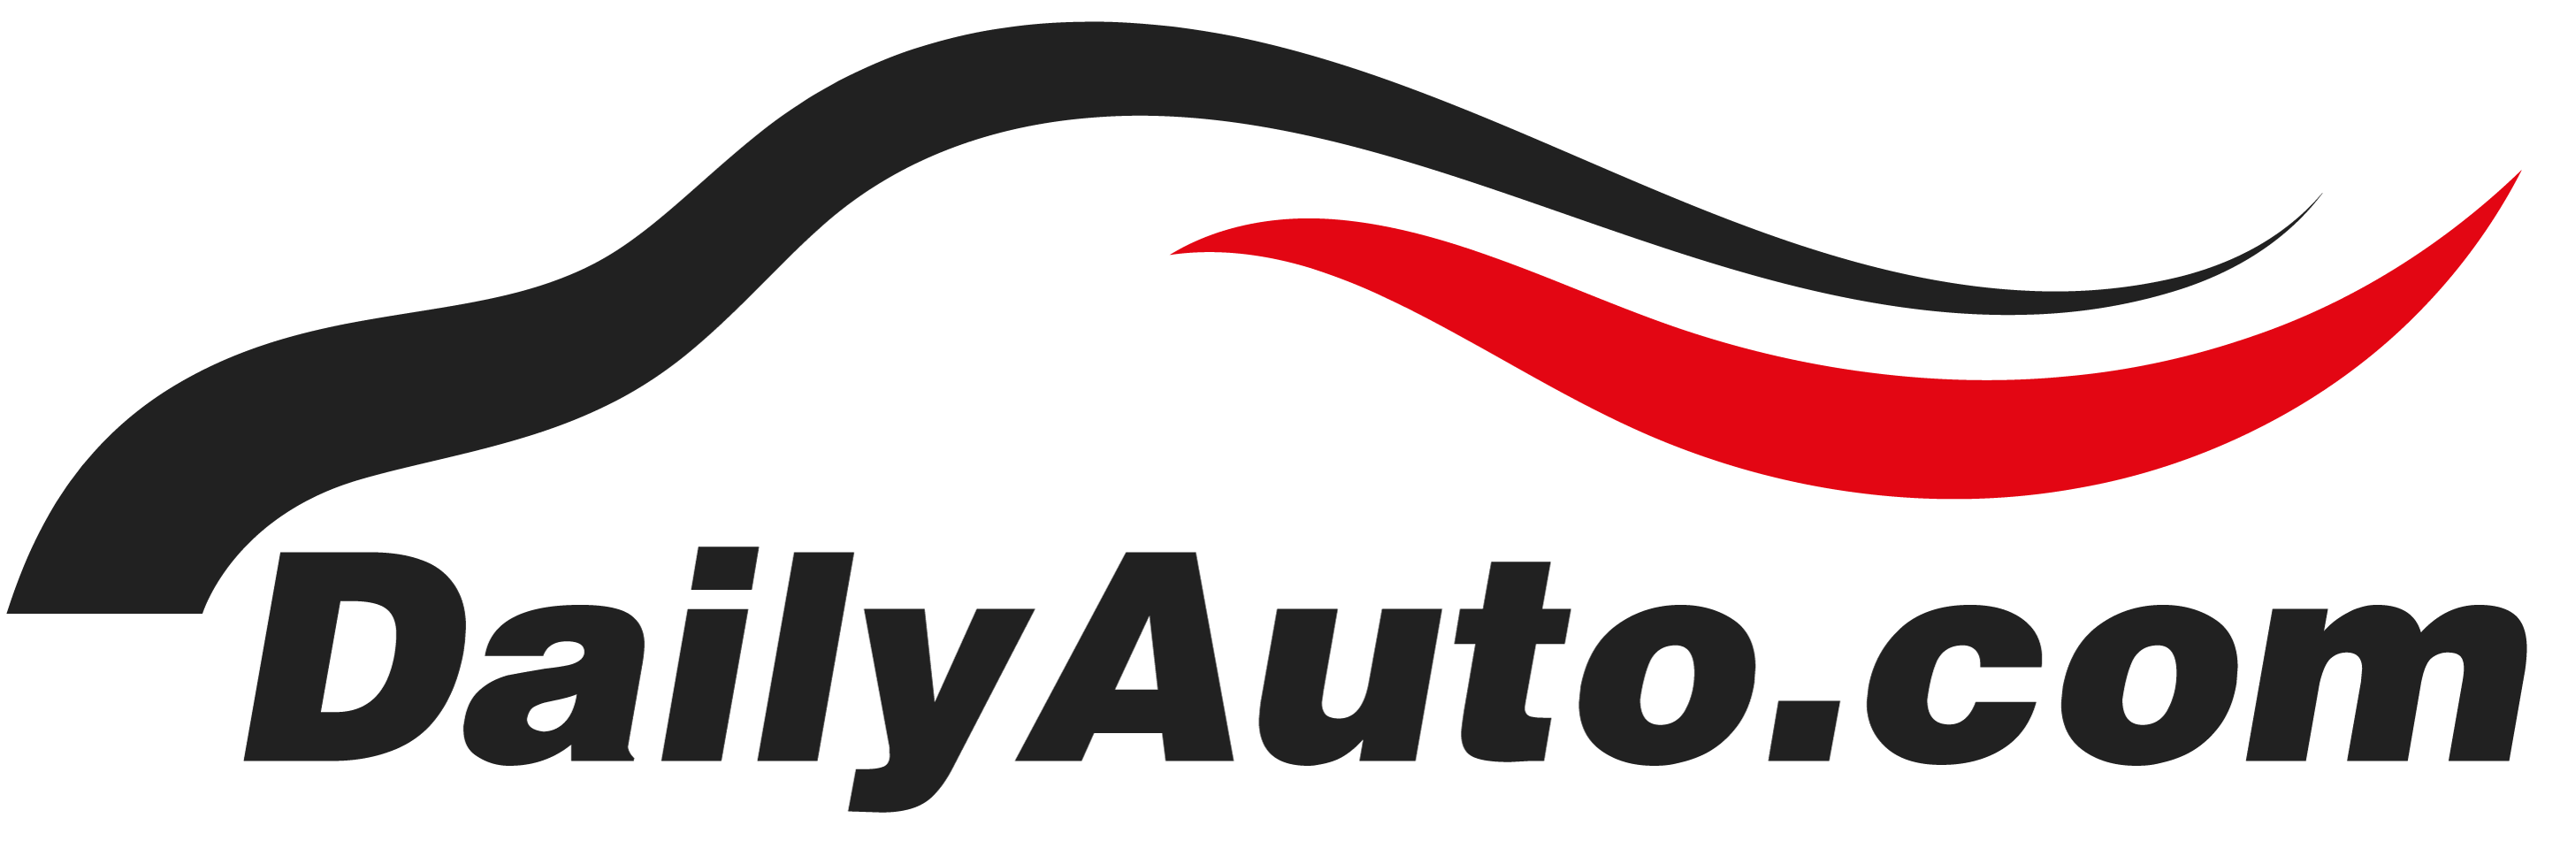 Daily Auto